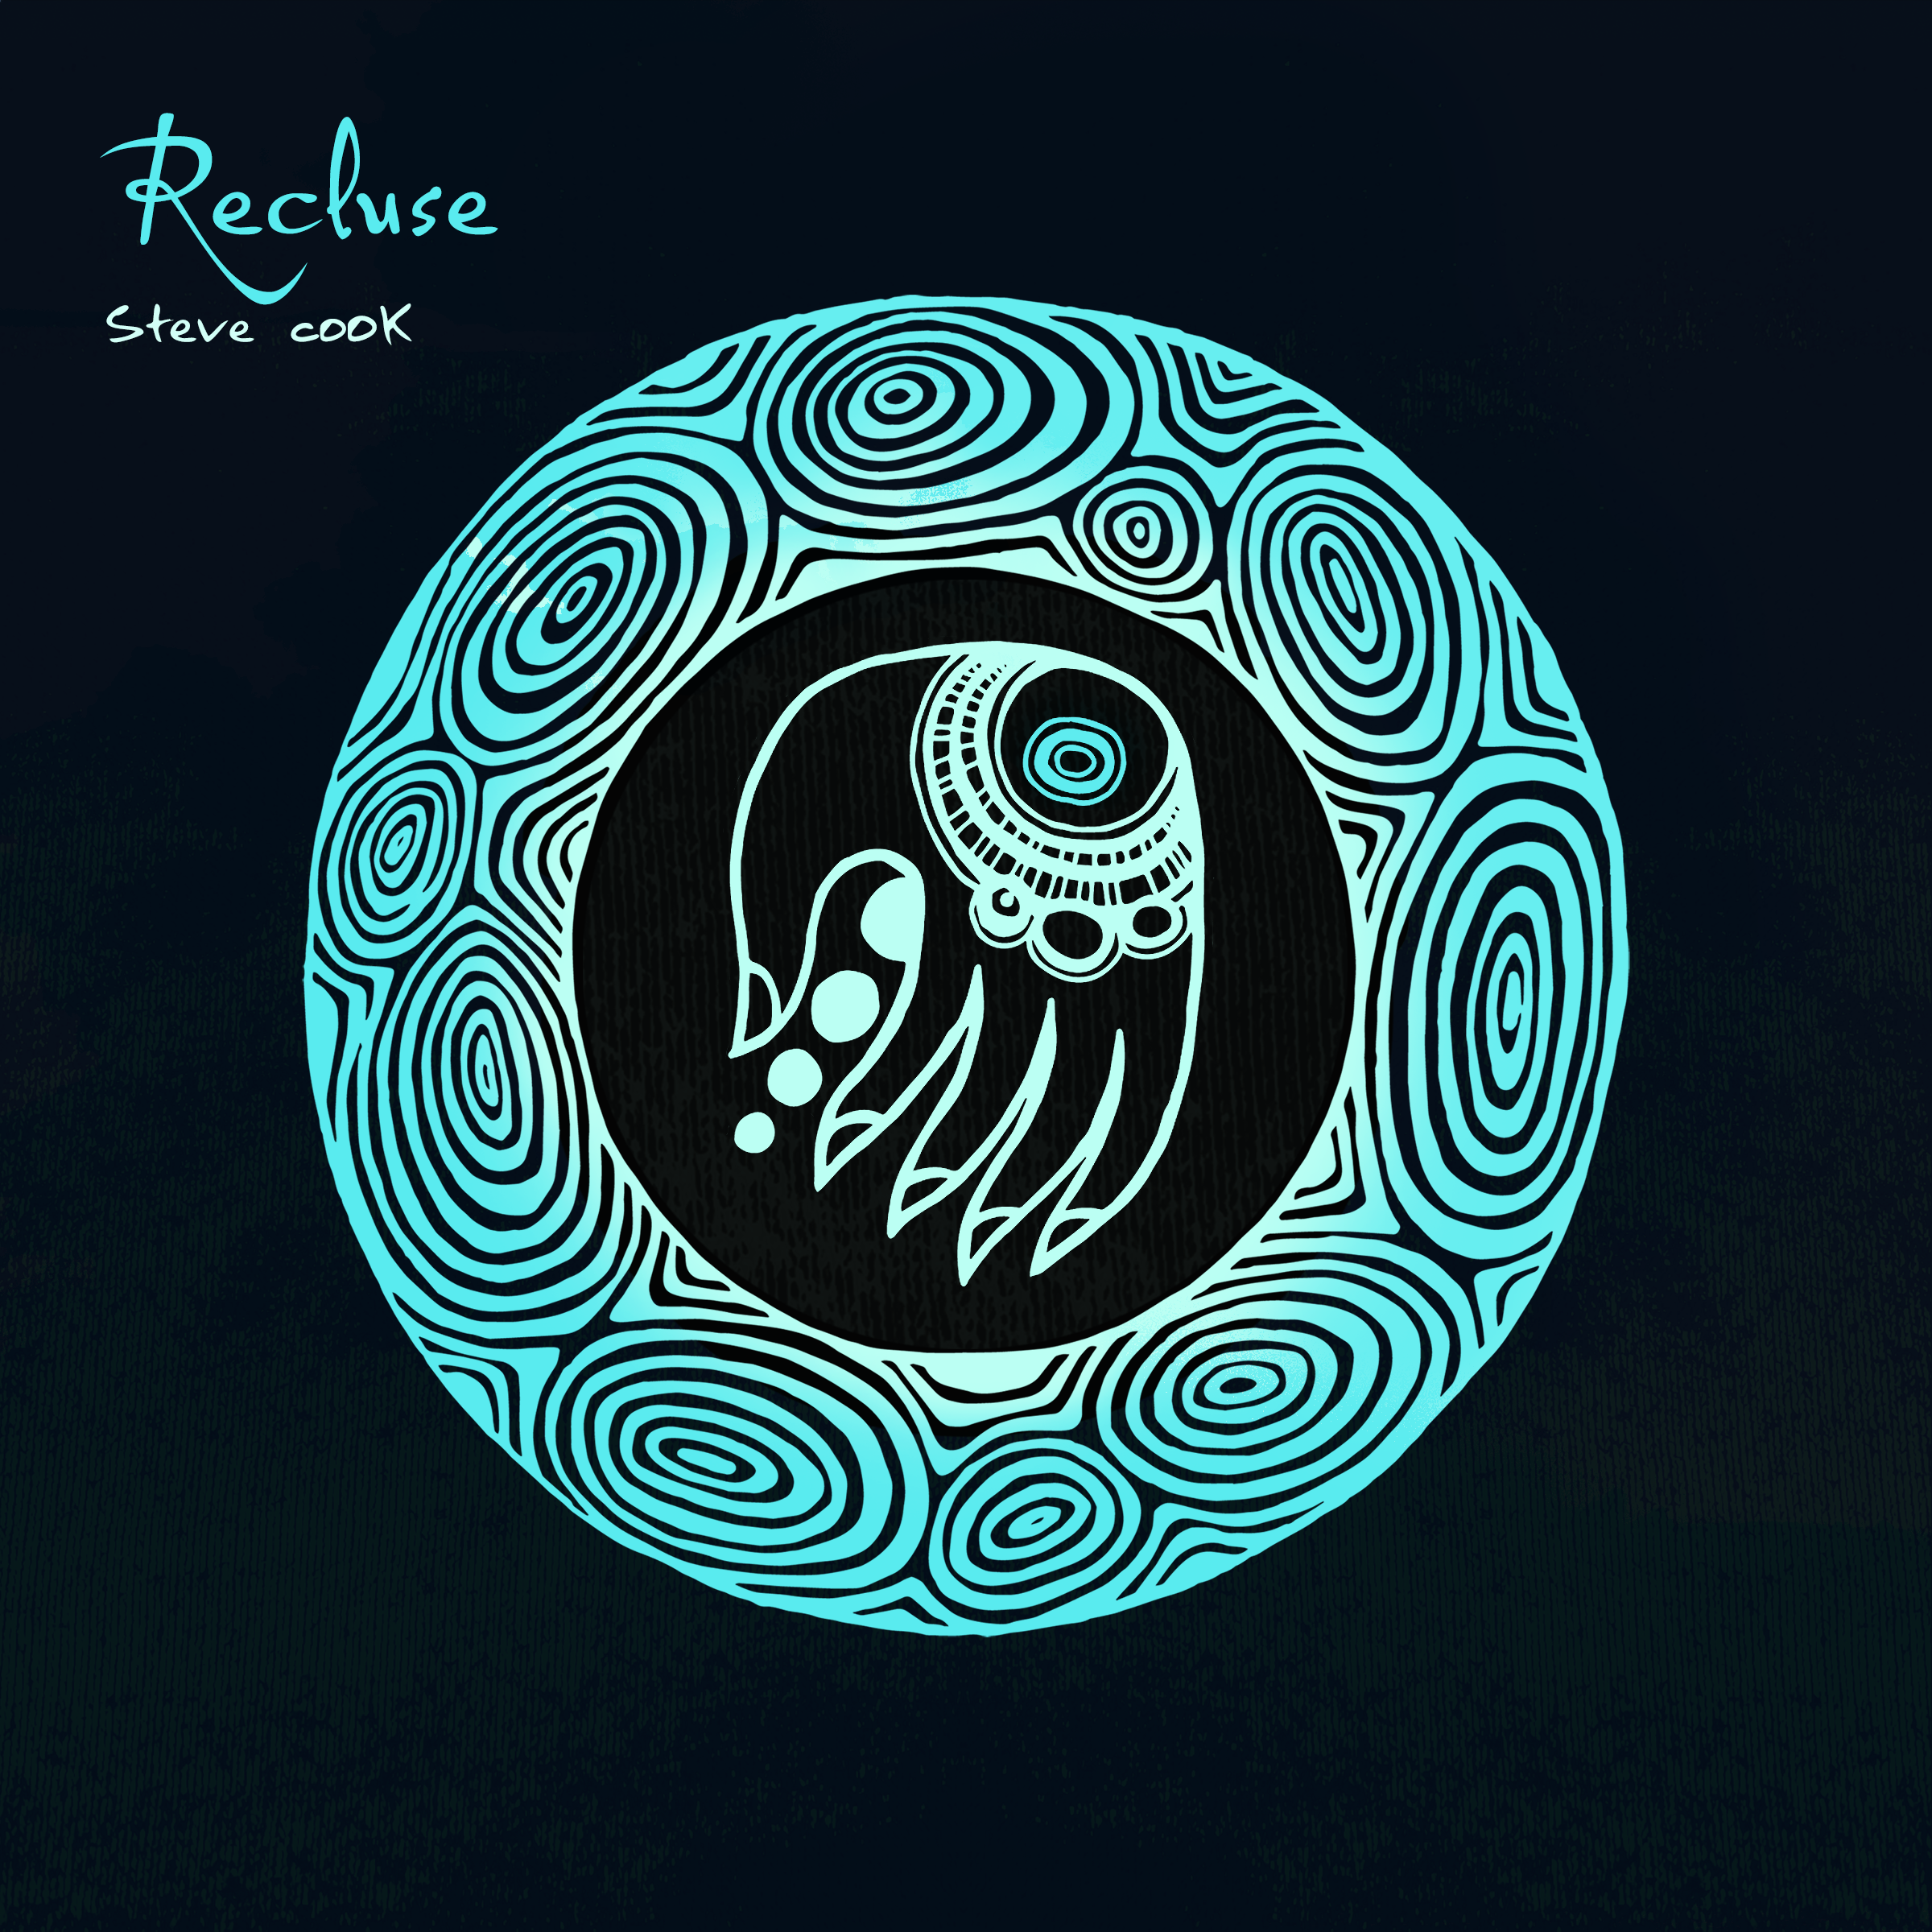 KOHDU002  - Steve Cook - Recluse (Incl Mark E, Ilves & Migova Remixes)